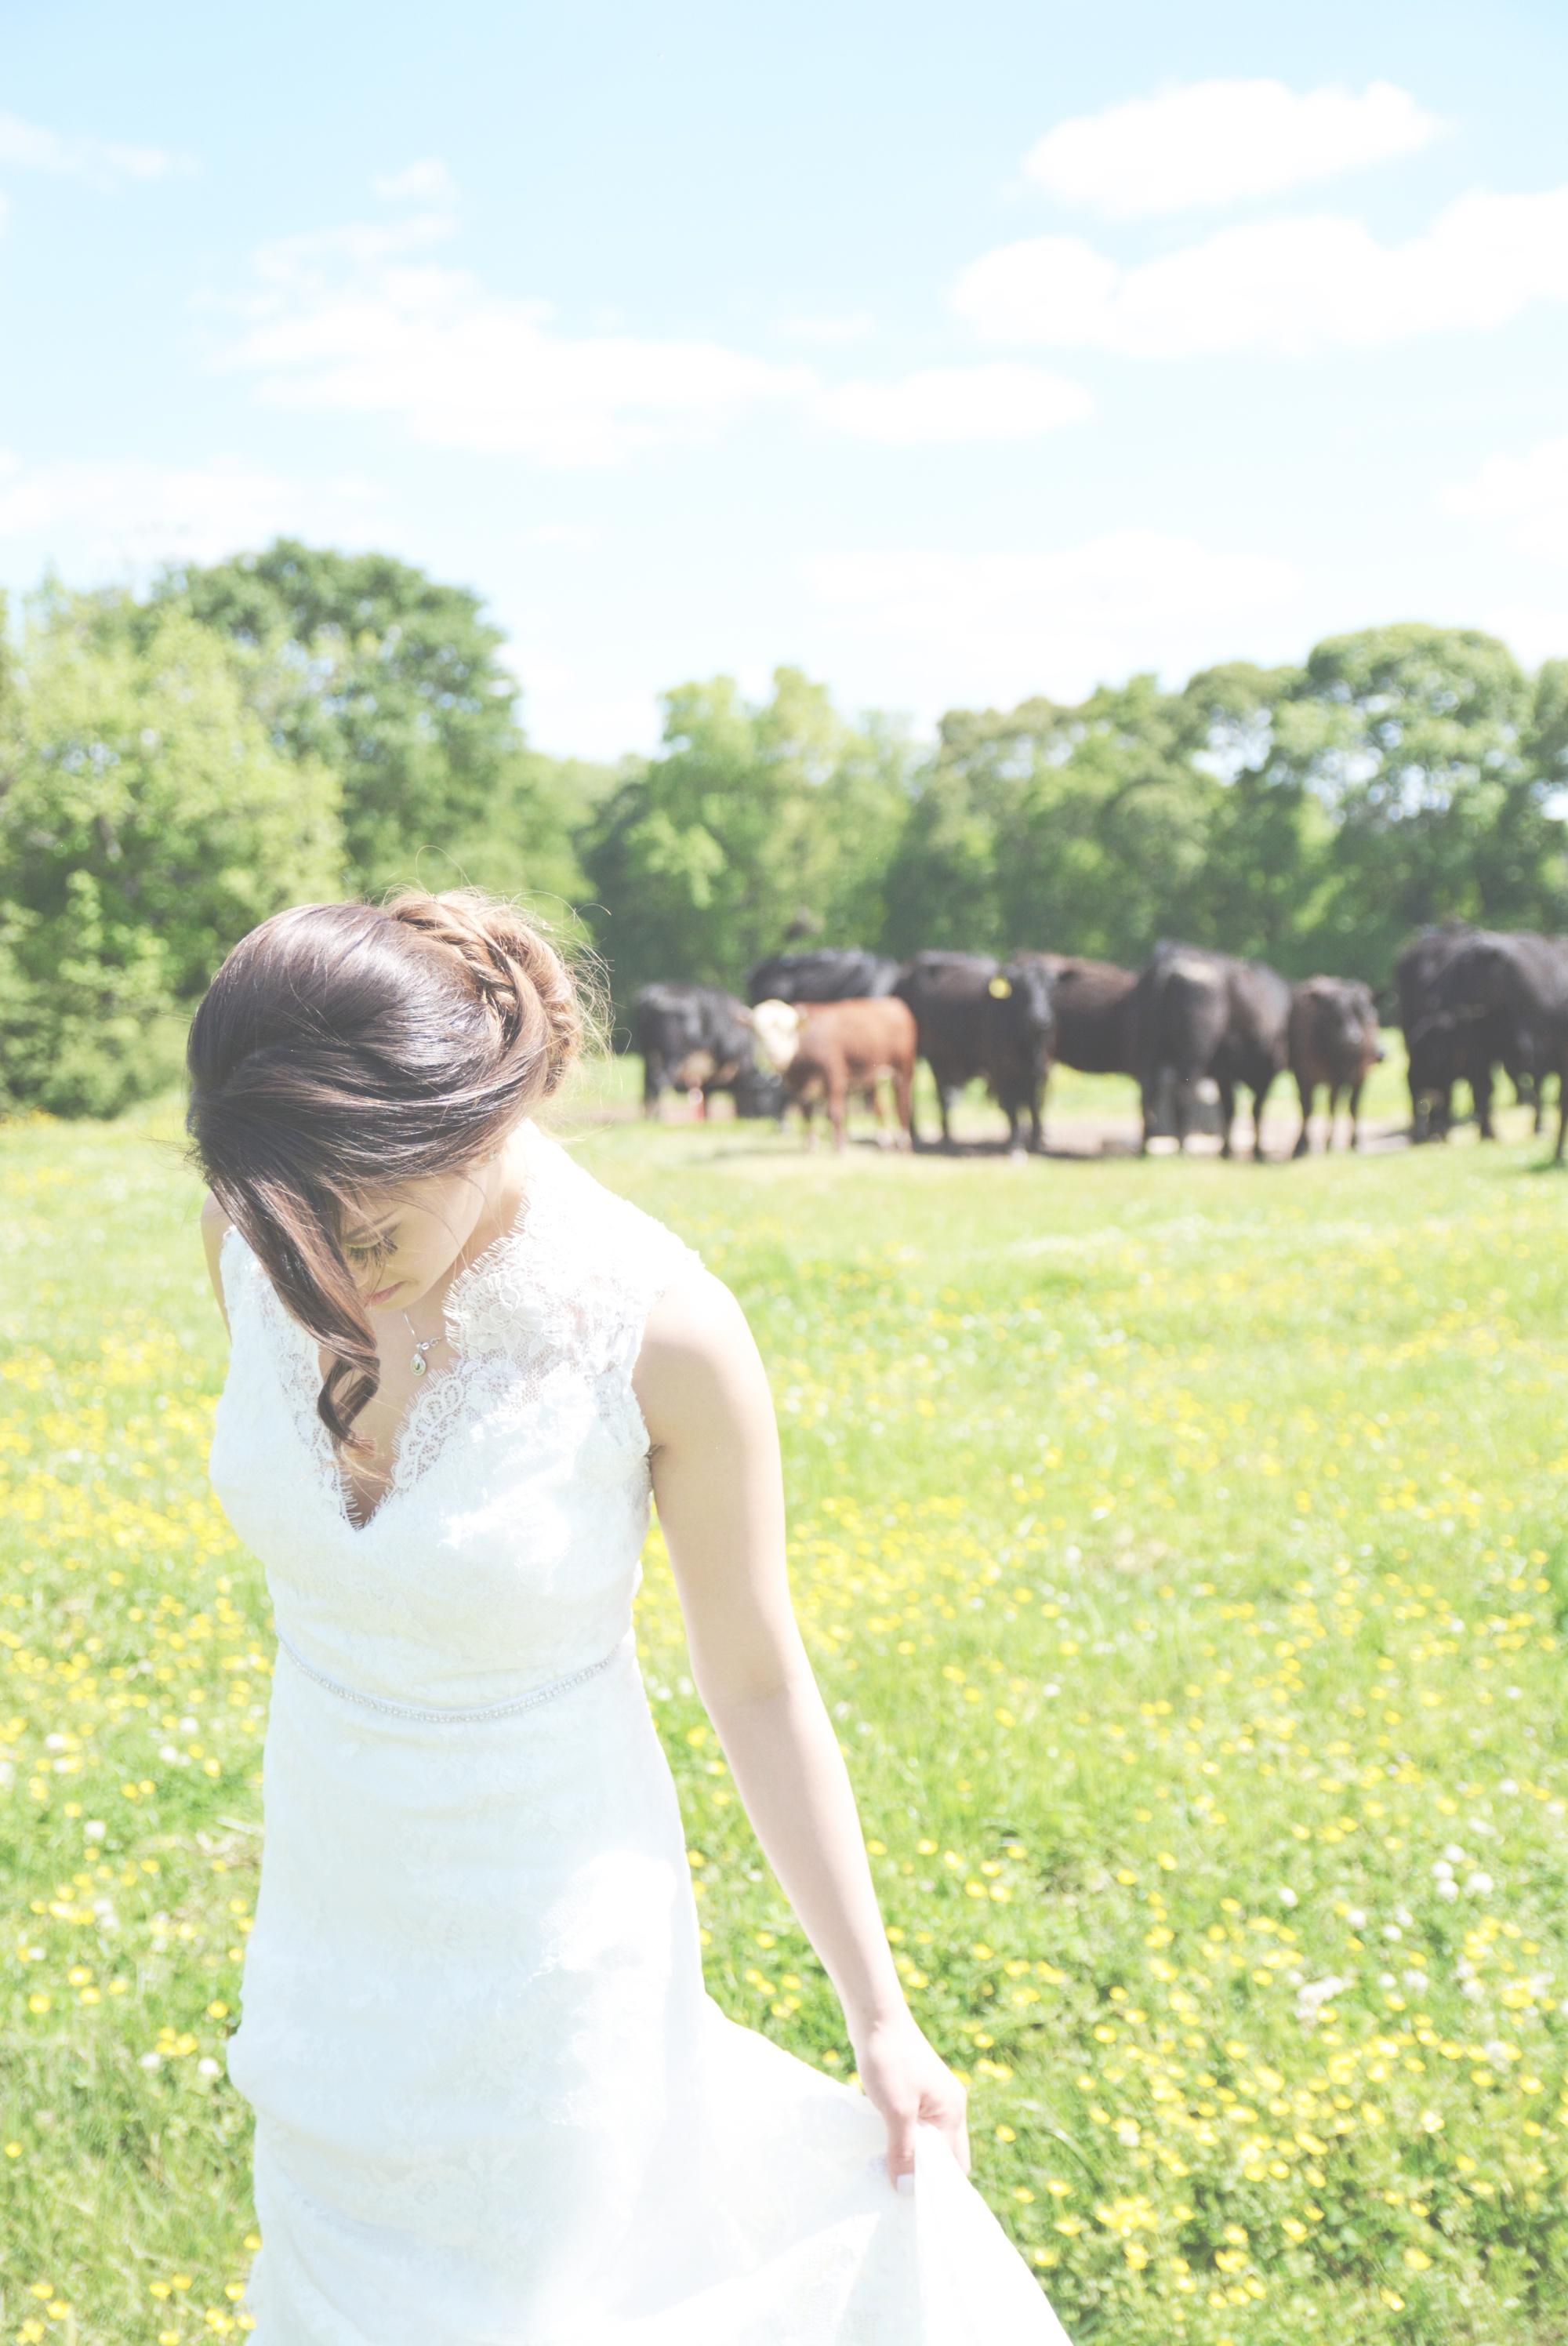 The Wright Farm Wedding Photography - Six Hearts Photography10